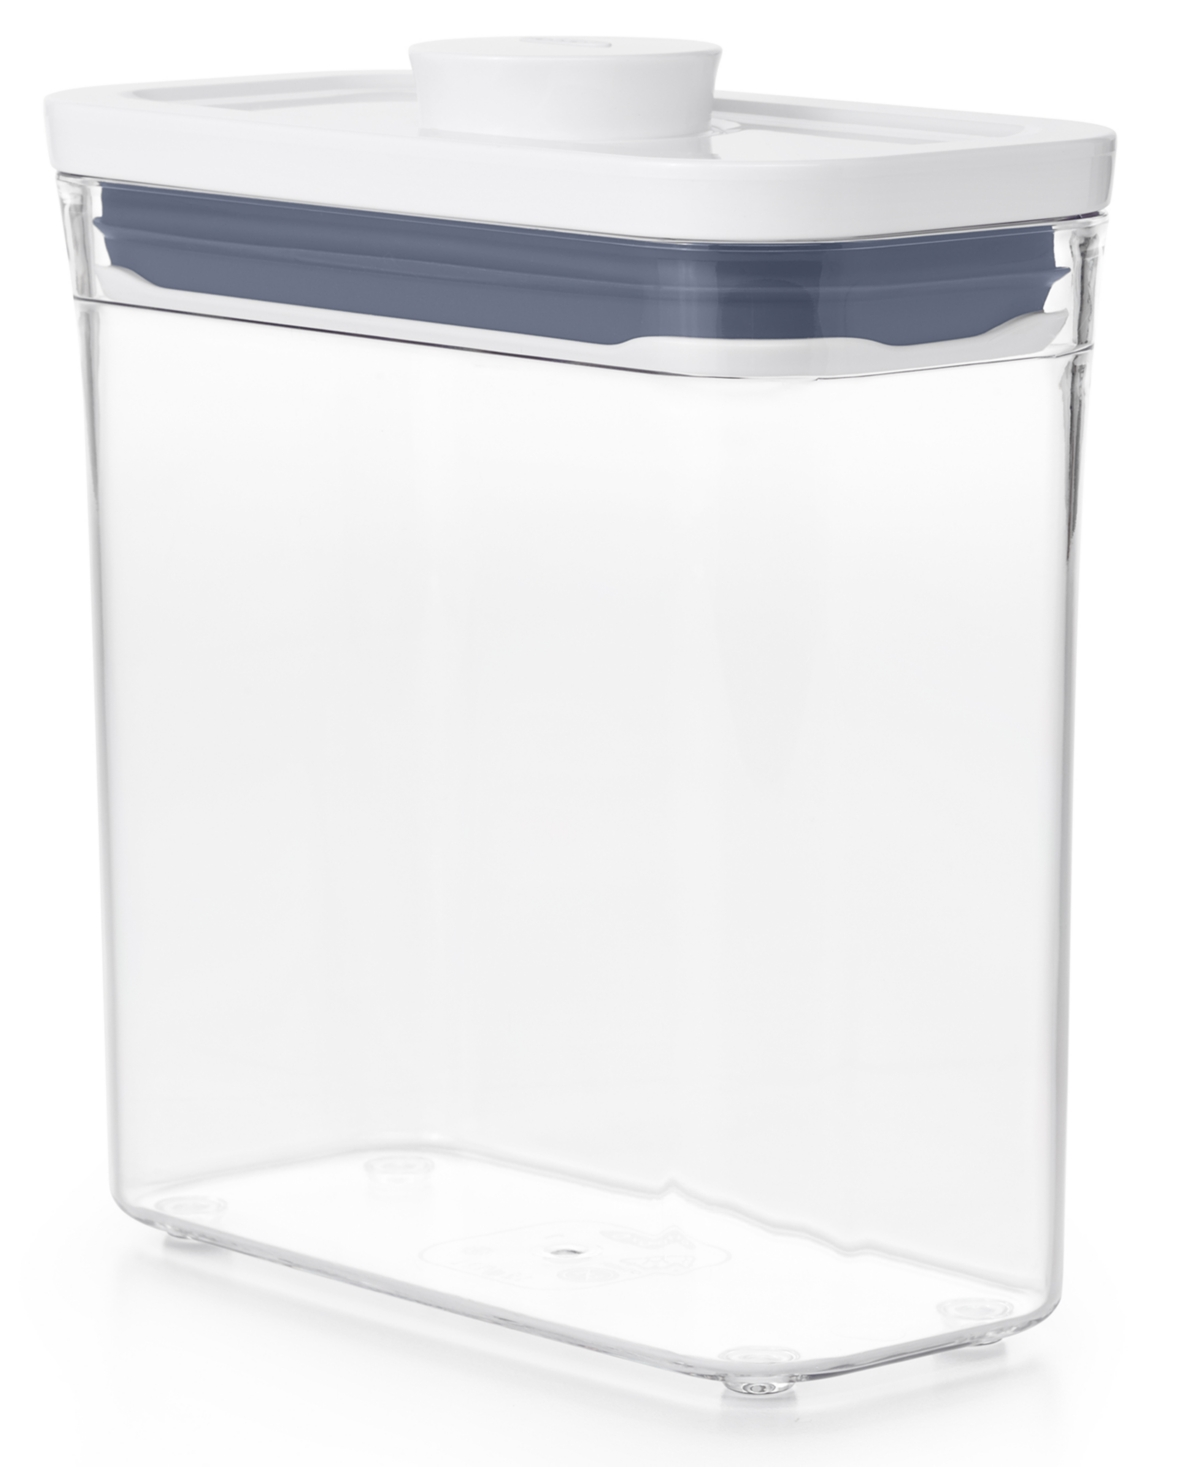 Oxo Pop Slim Short Rectangular Food Storage Container